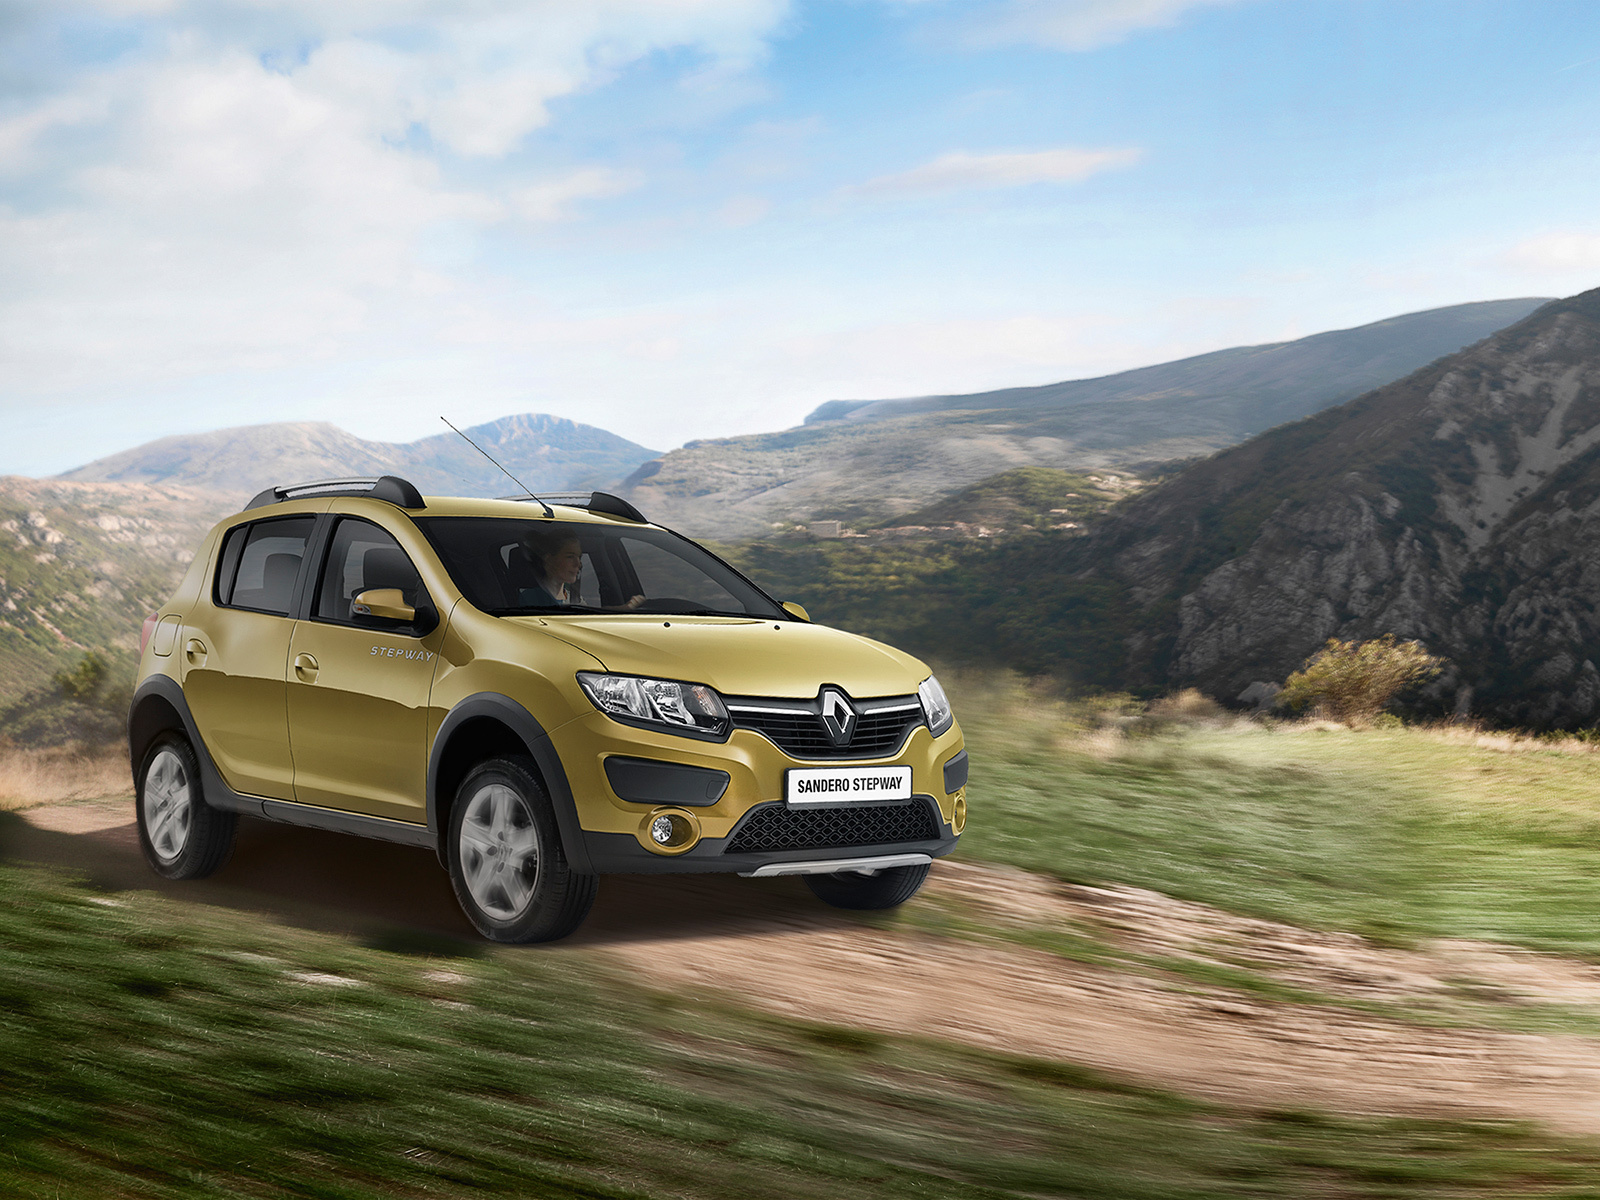 Nuevo Renault Sandero Stepway